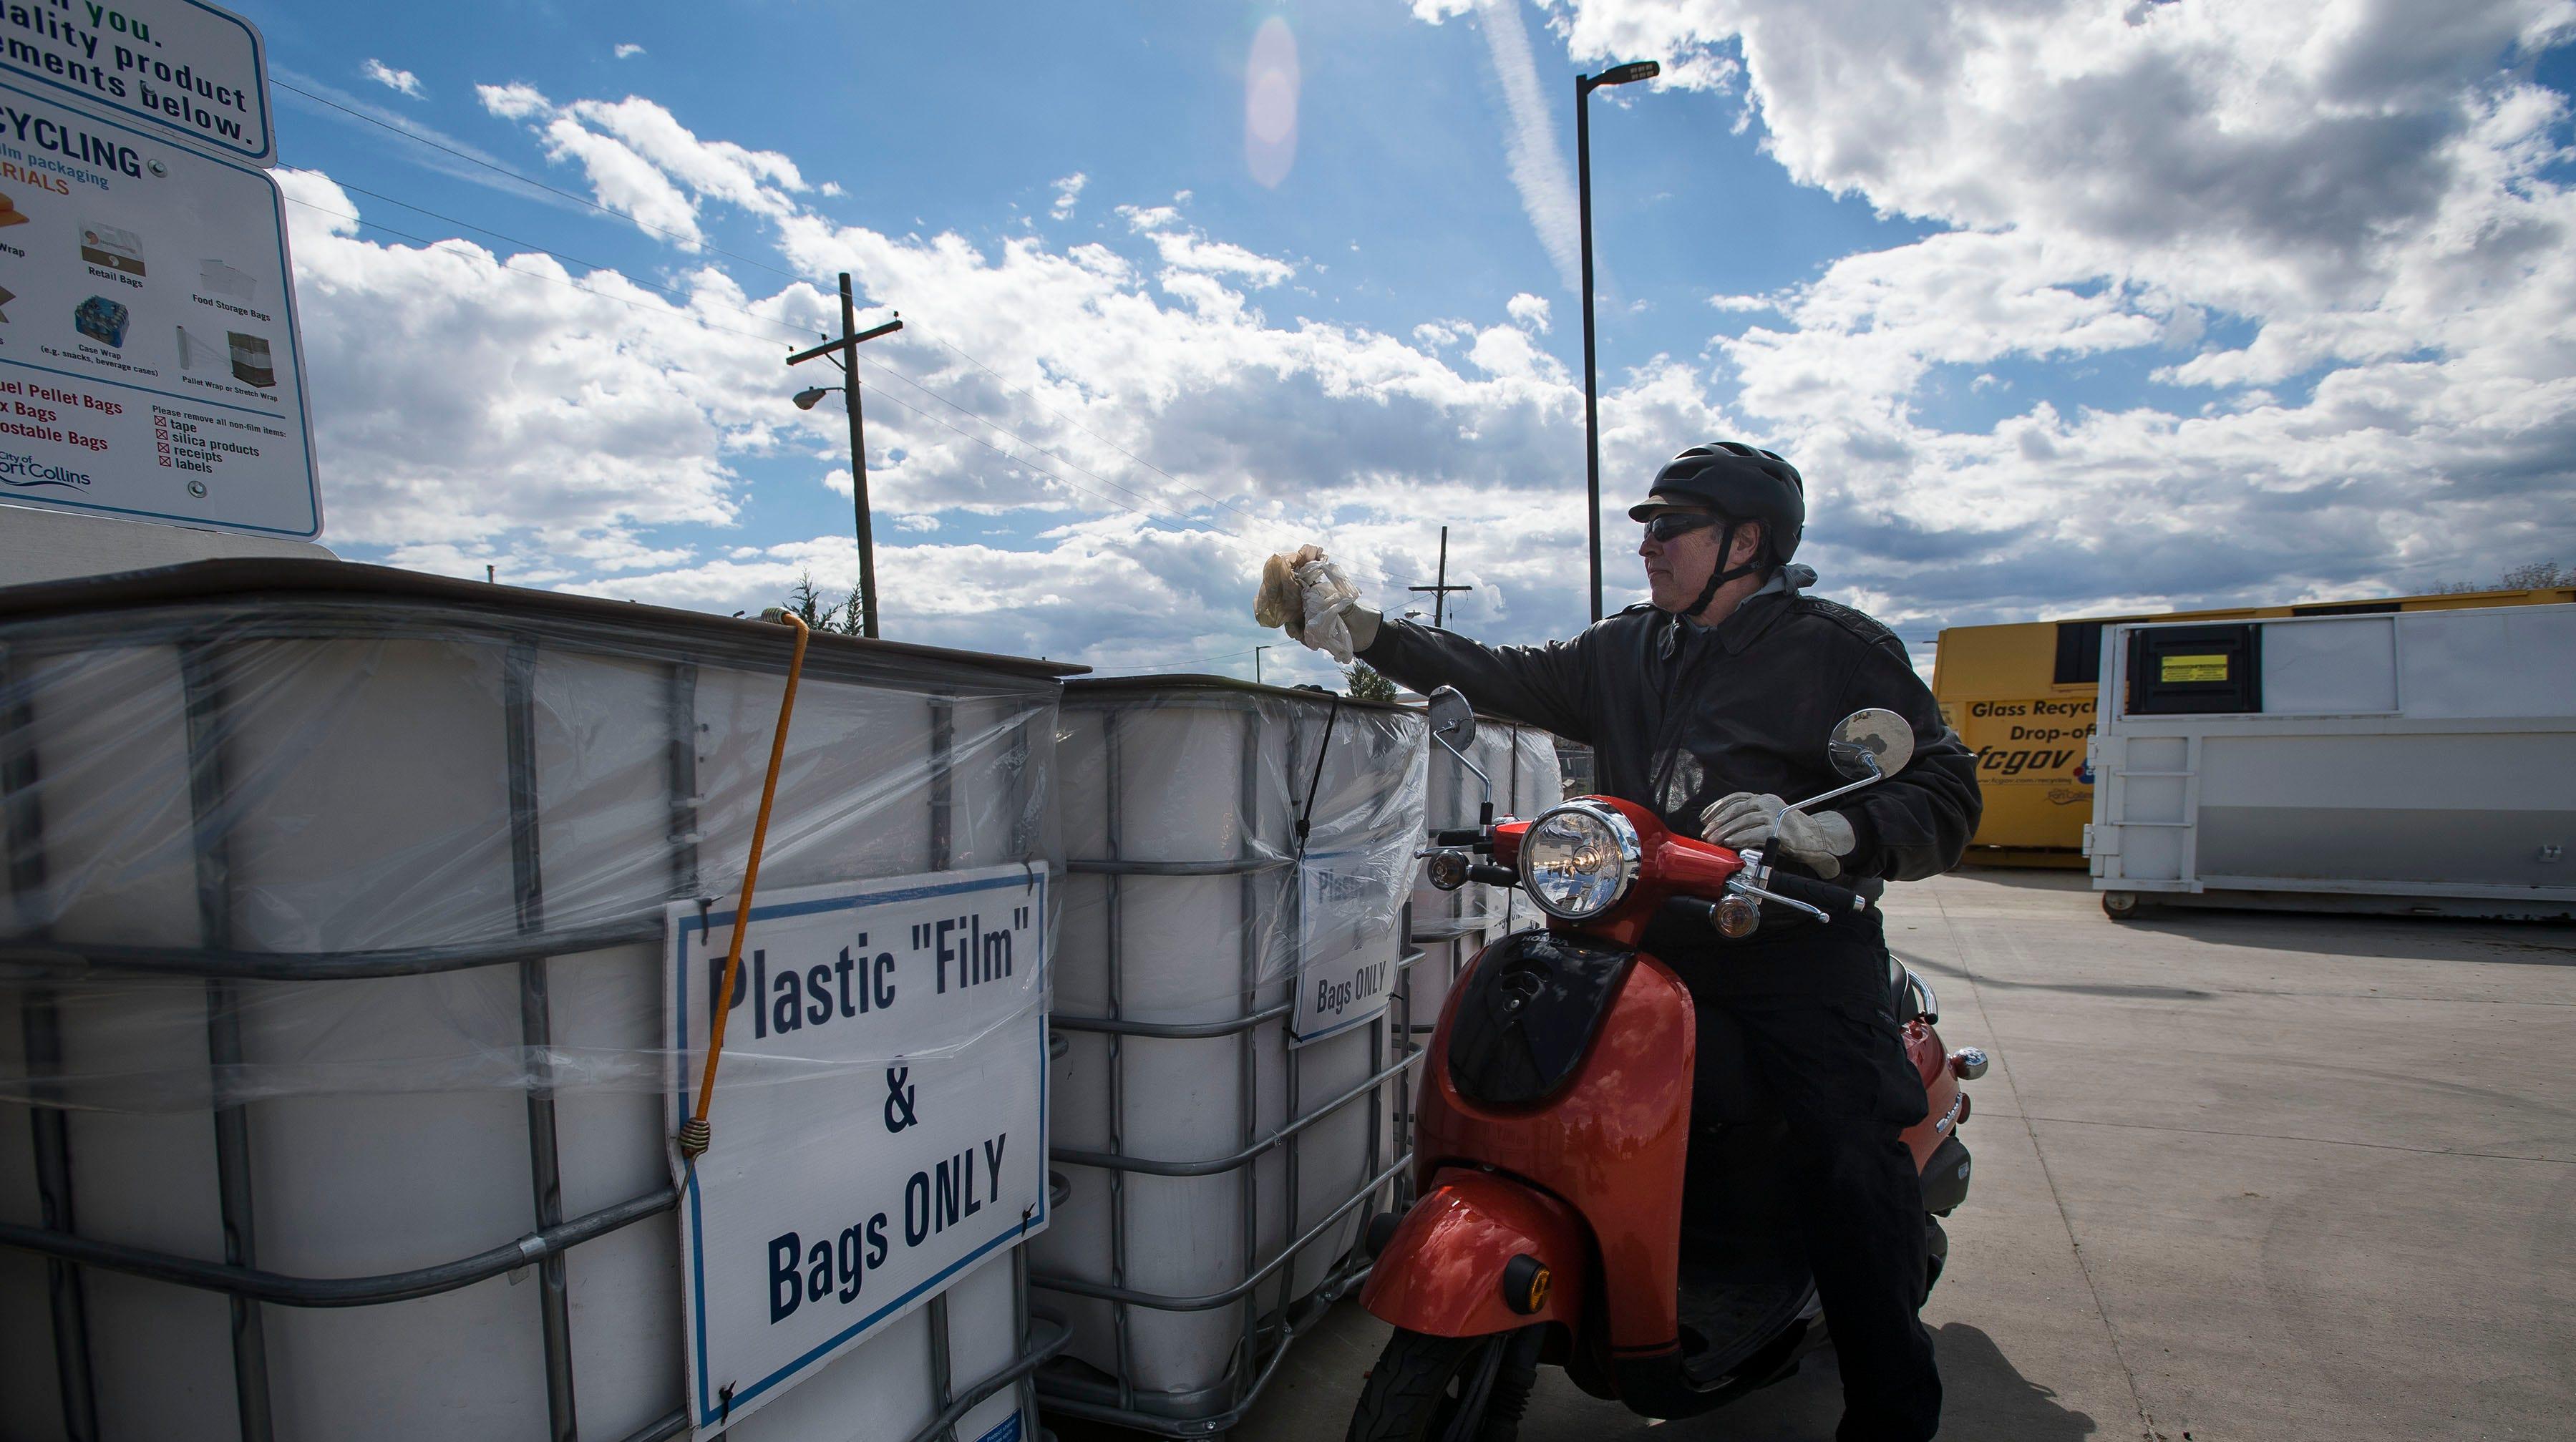 Fort Collins group wants plastic bag ban on next ballot